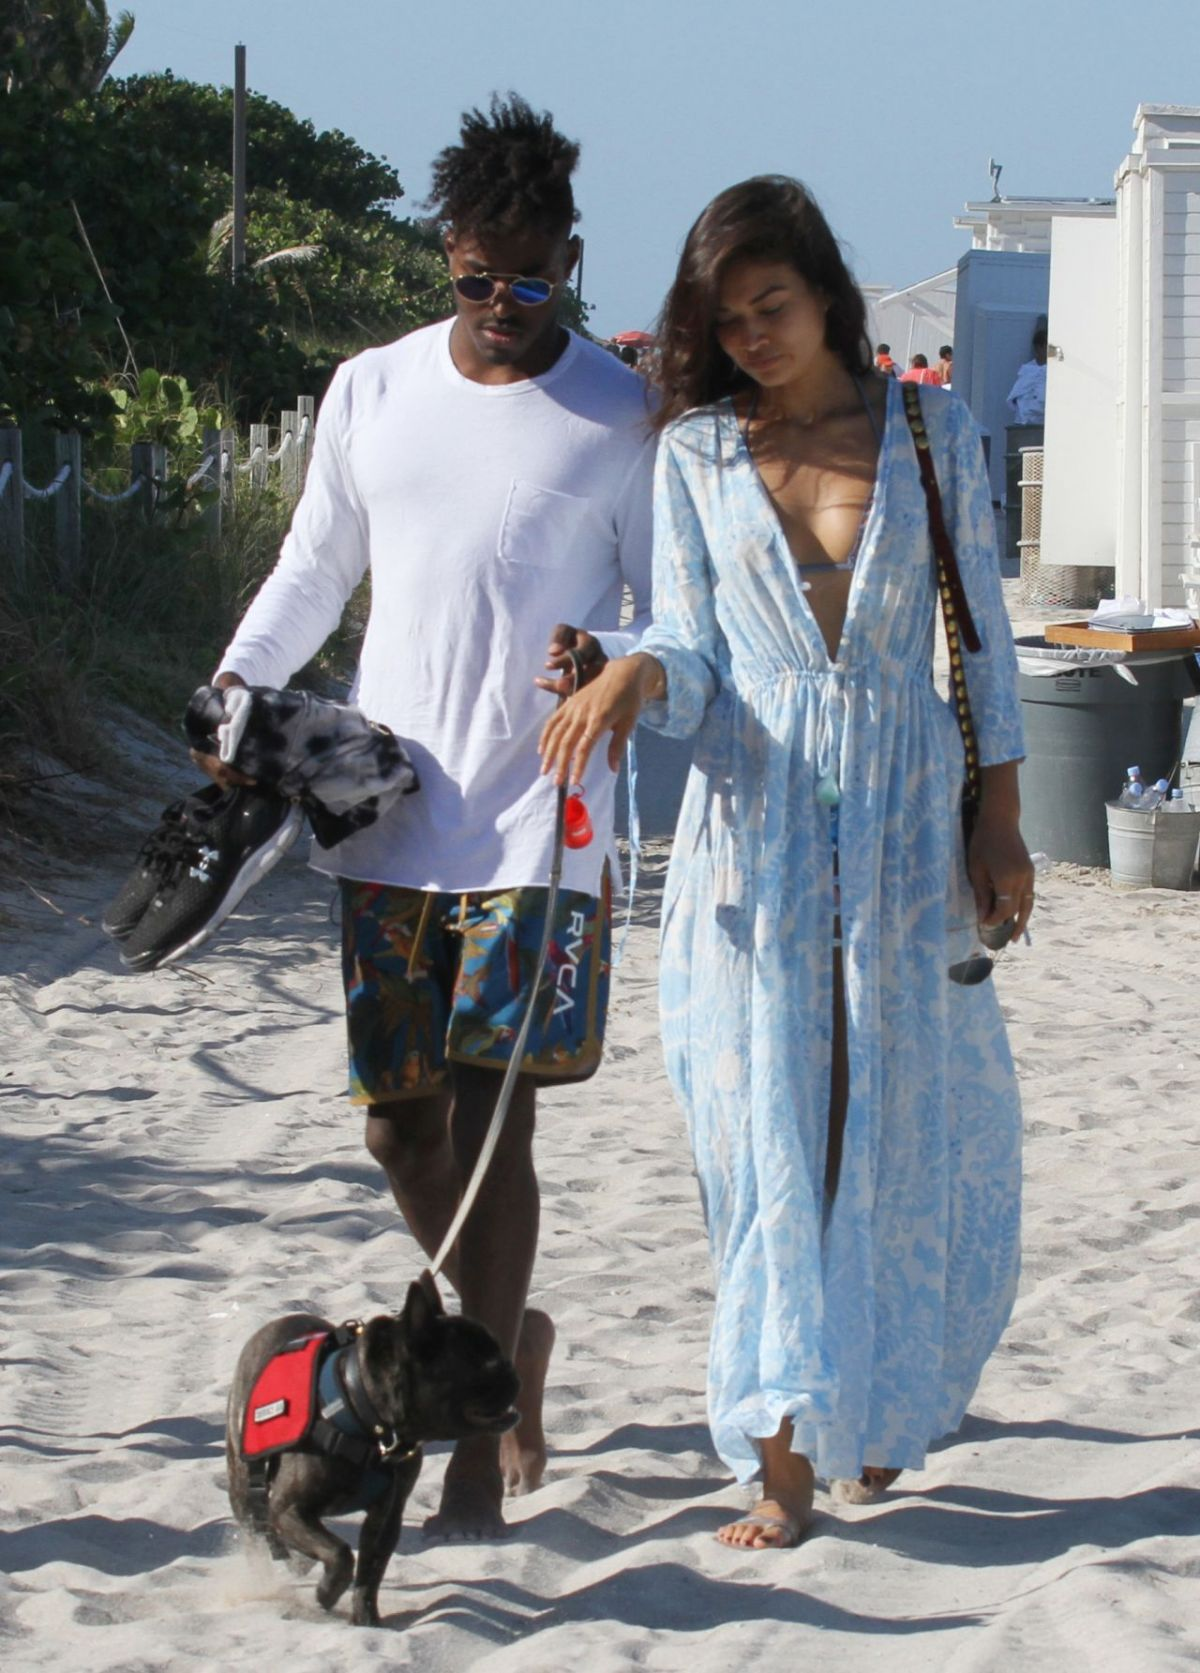 SHANINA SHAIK ad DJ Ruckus at a Beach in Miami 04/24/2016